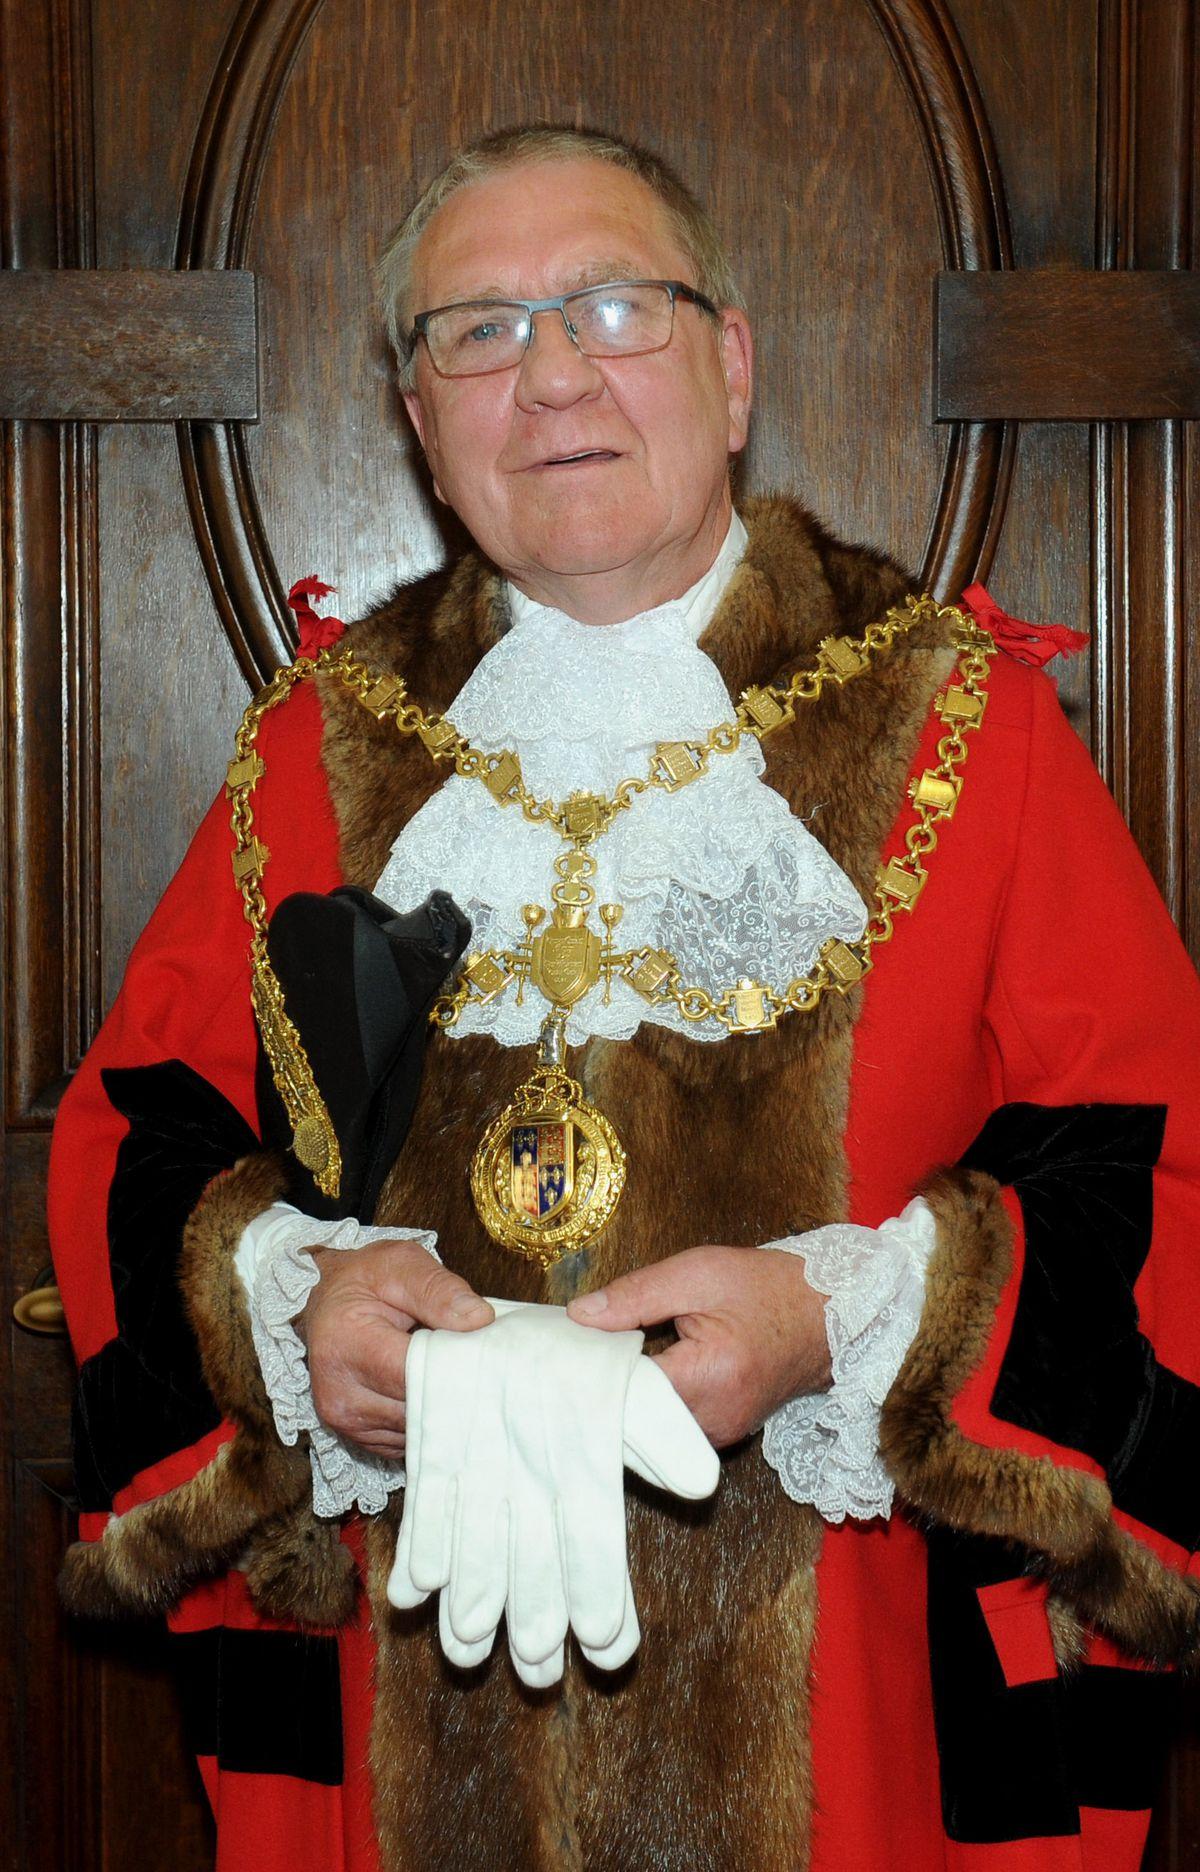 Mayor Paul Bott in his robes